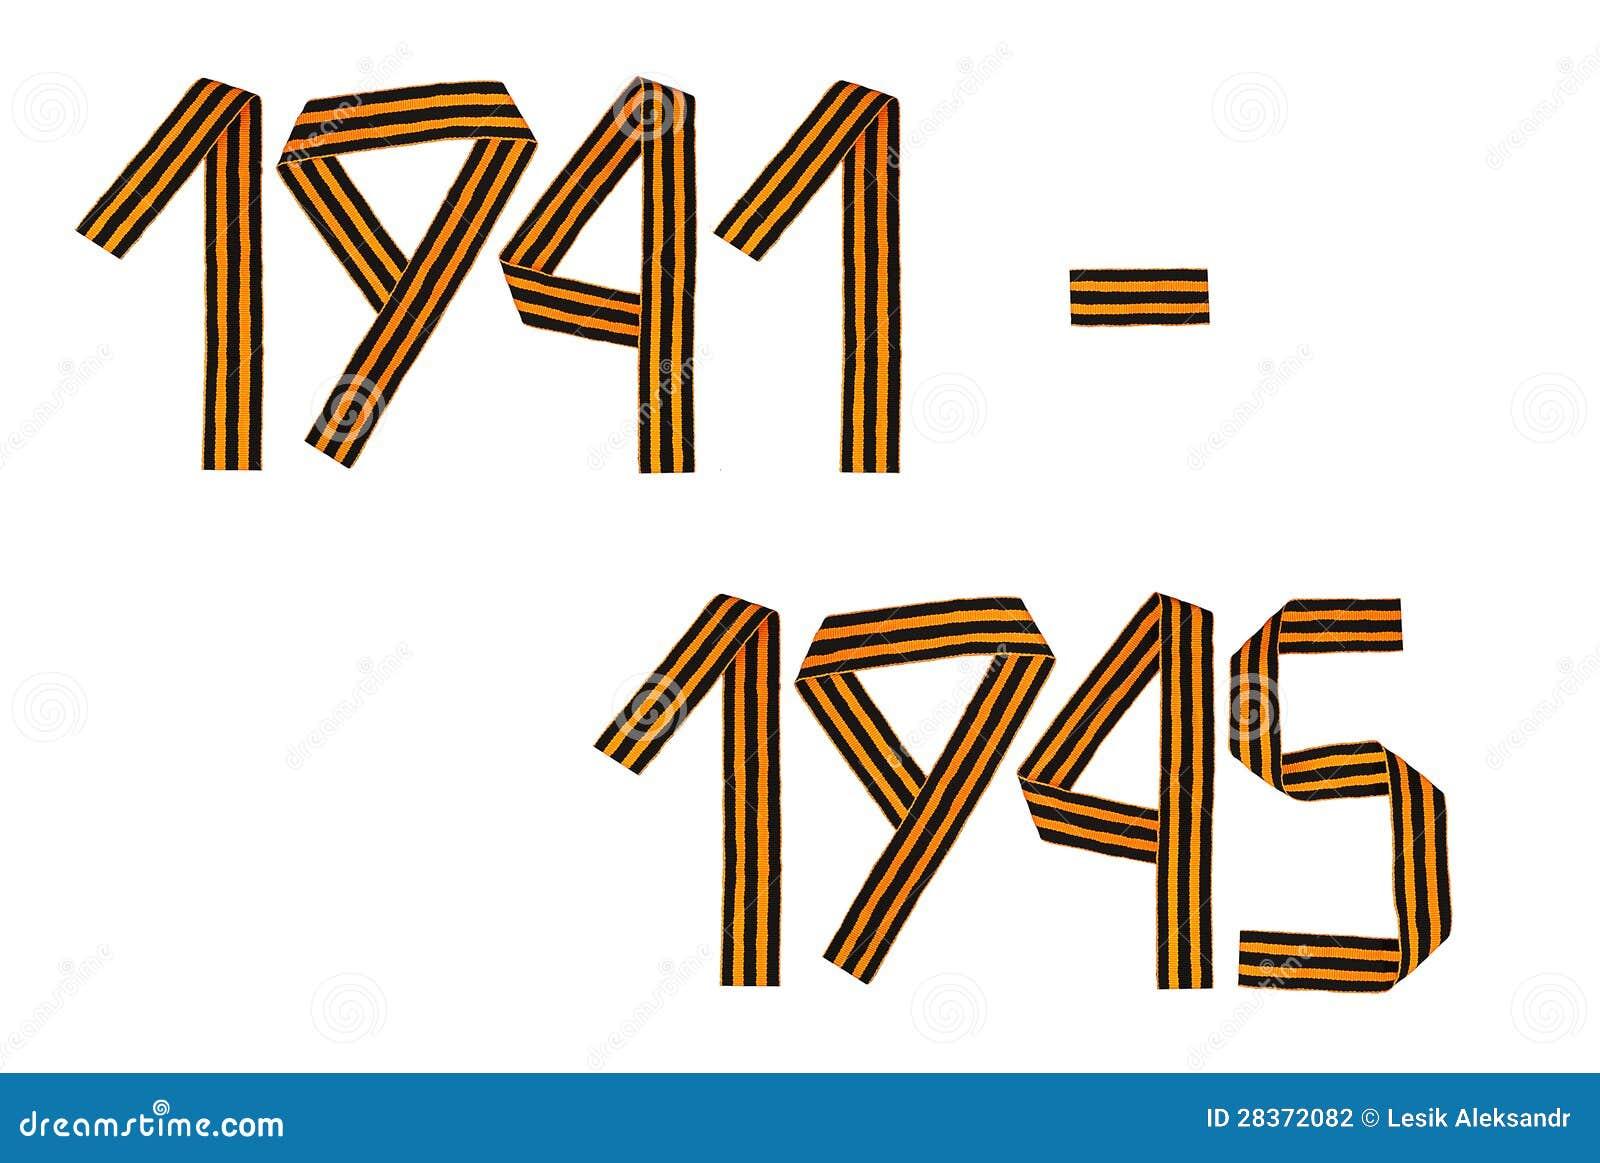 1941 1945 world war ii st george ribbon the symbol of victor royalty free stock photo buycottarizona Gallery